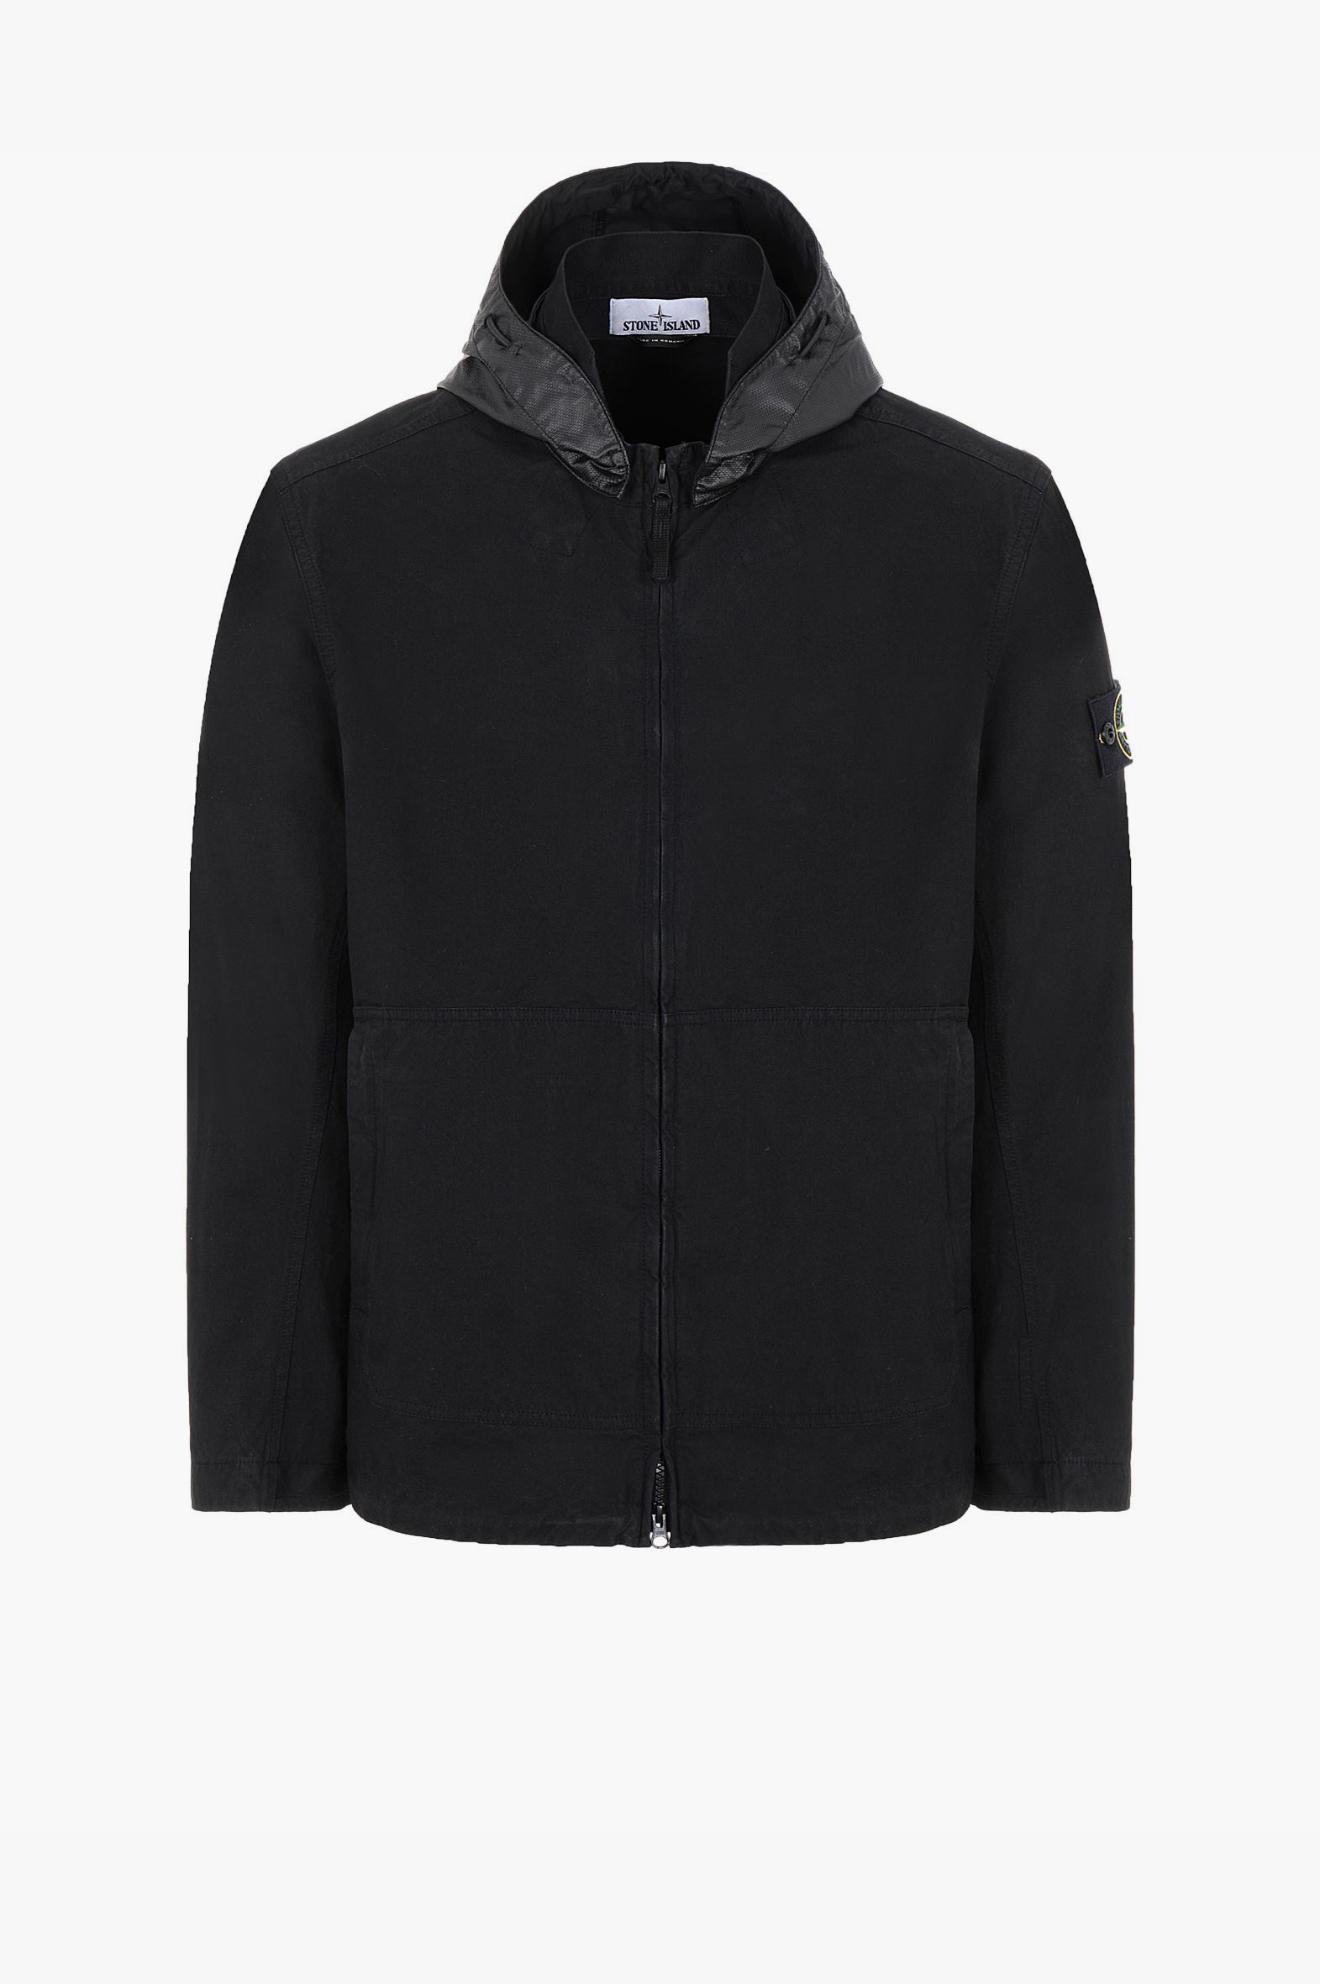 Cotton/Cordura Hooded Jacket Black